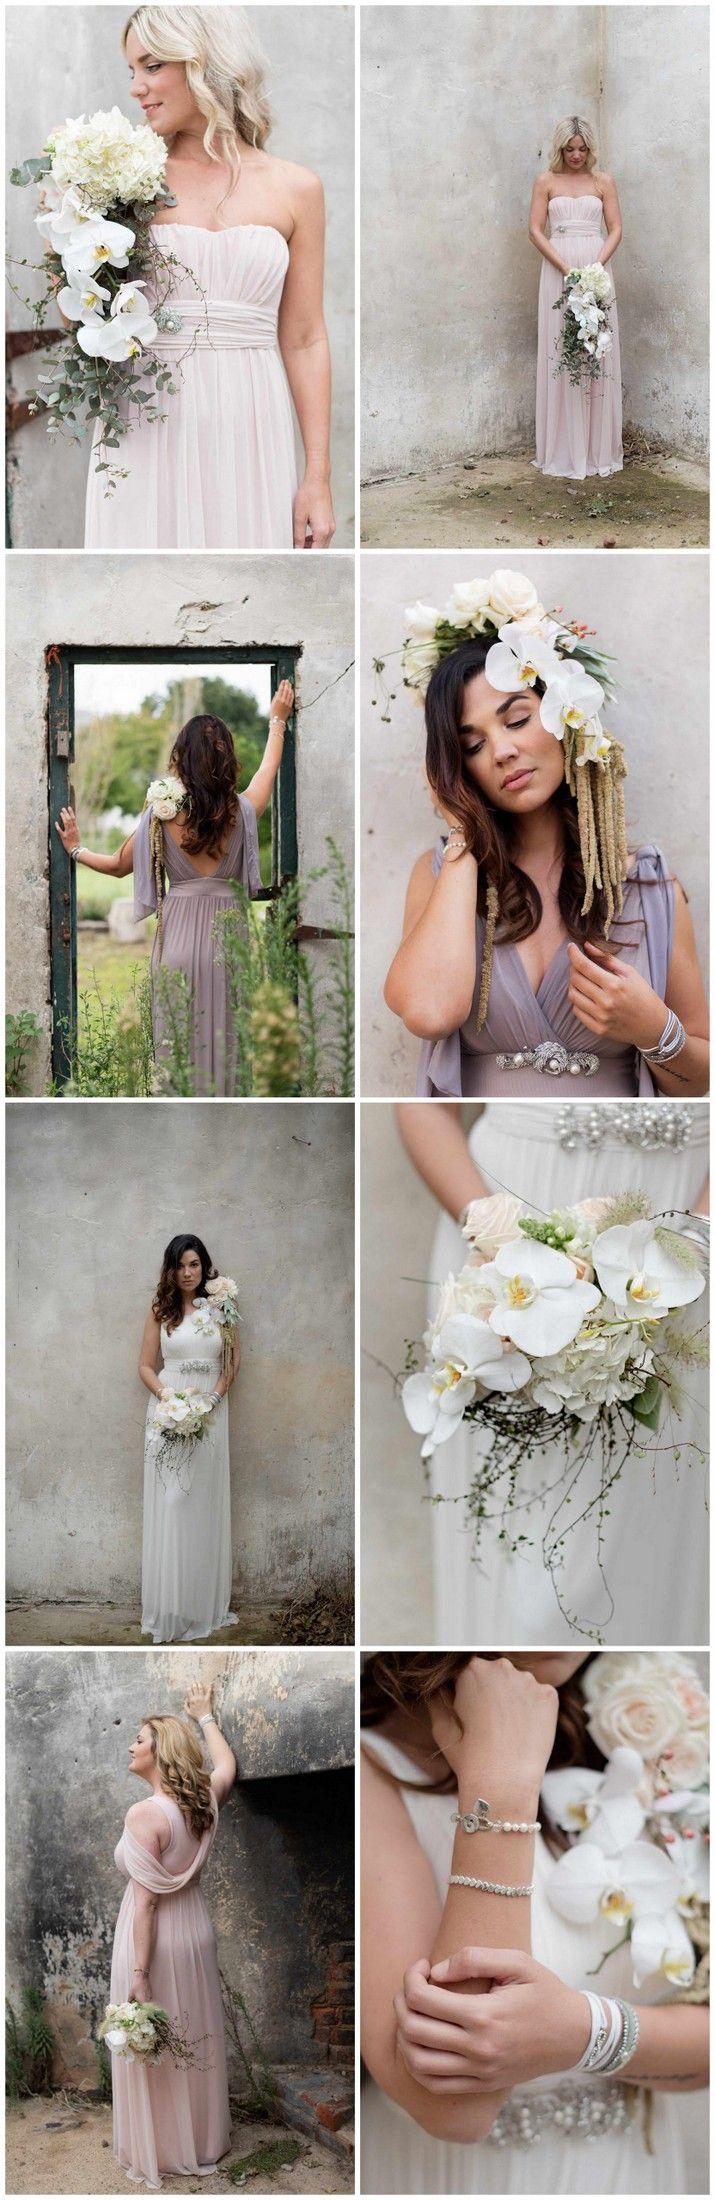 Best 25 bohemian bridesmaid ideas on pinterest bohemian best 25 bohemian bridesmaid ideas on pinterest bohemian bridesmaid dresses boho bridesmaid dresses and boho bridesmaids ombrellifo Gallery